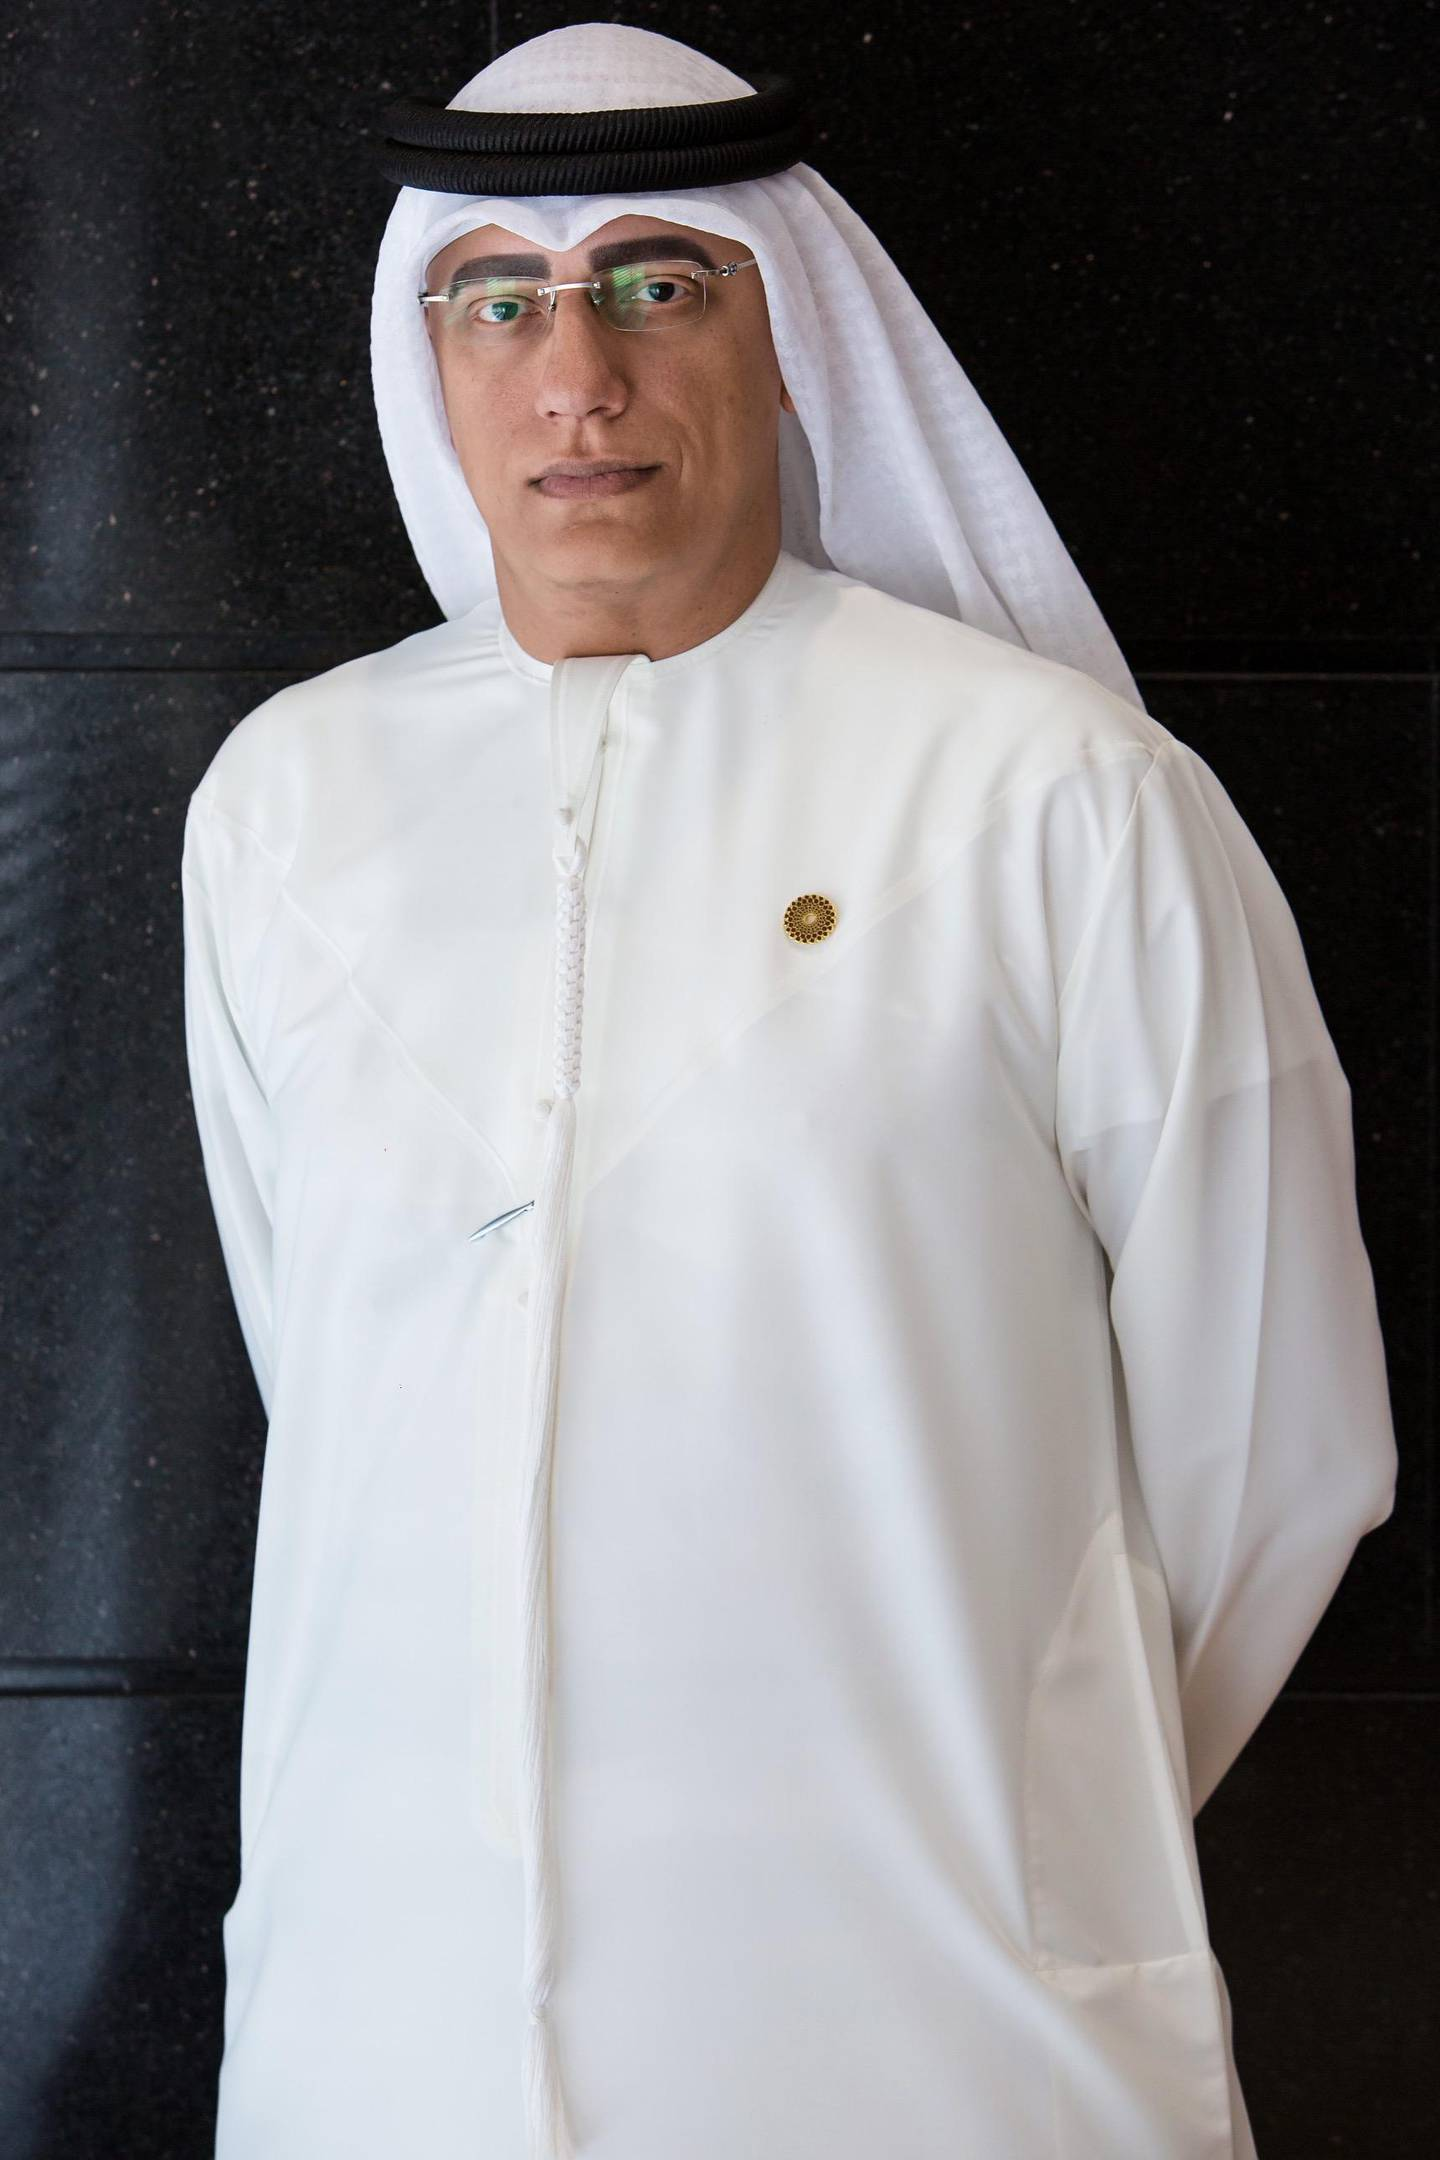 Ahmed Al Khatib, (Senior VP, Expo 2020 Dubai) ,Leaders in Construction UAE , Godolphin Ballroom, Jumeirah Emirates Towers, Financial Centre 2 ,Dubai, United Arab Emirates, 19/09/2017Photo by Fritz John Asuro/ITP Images